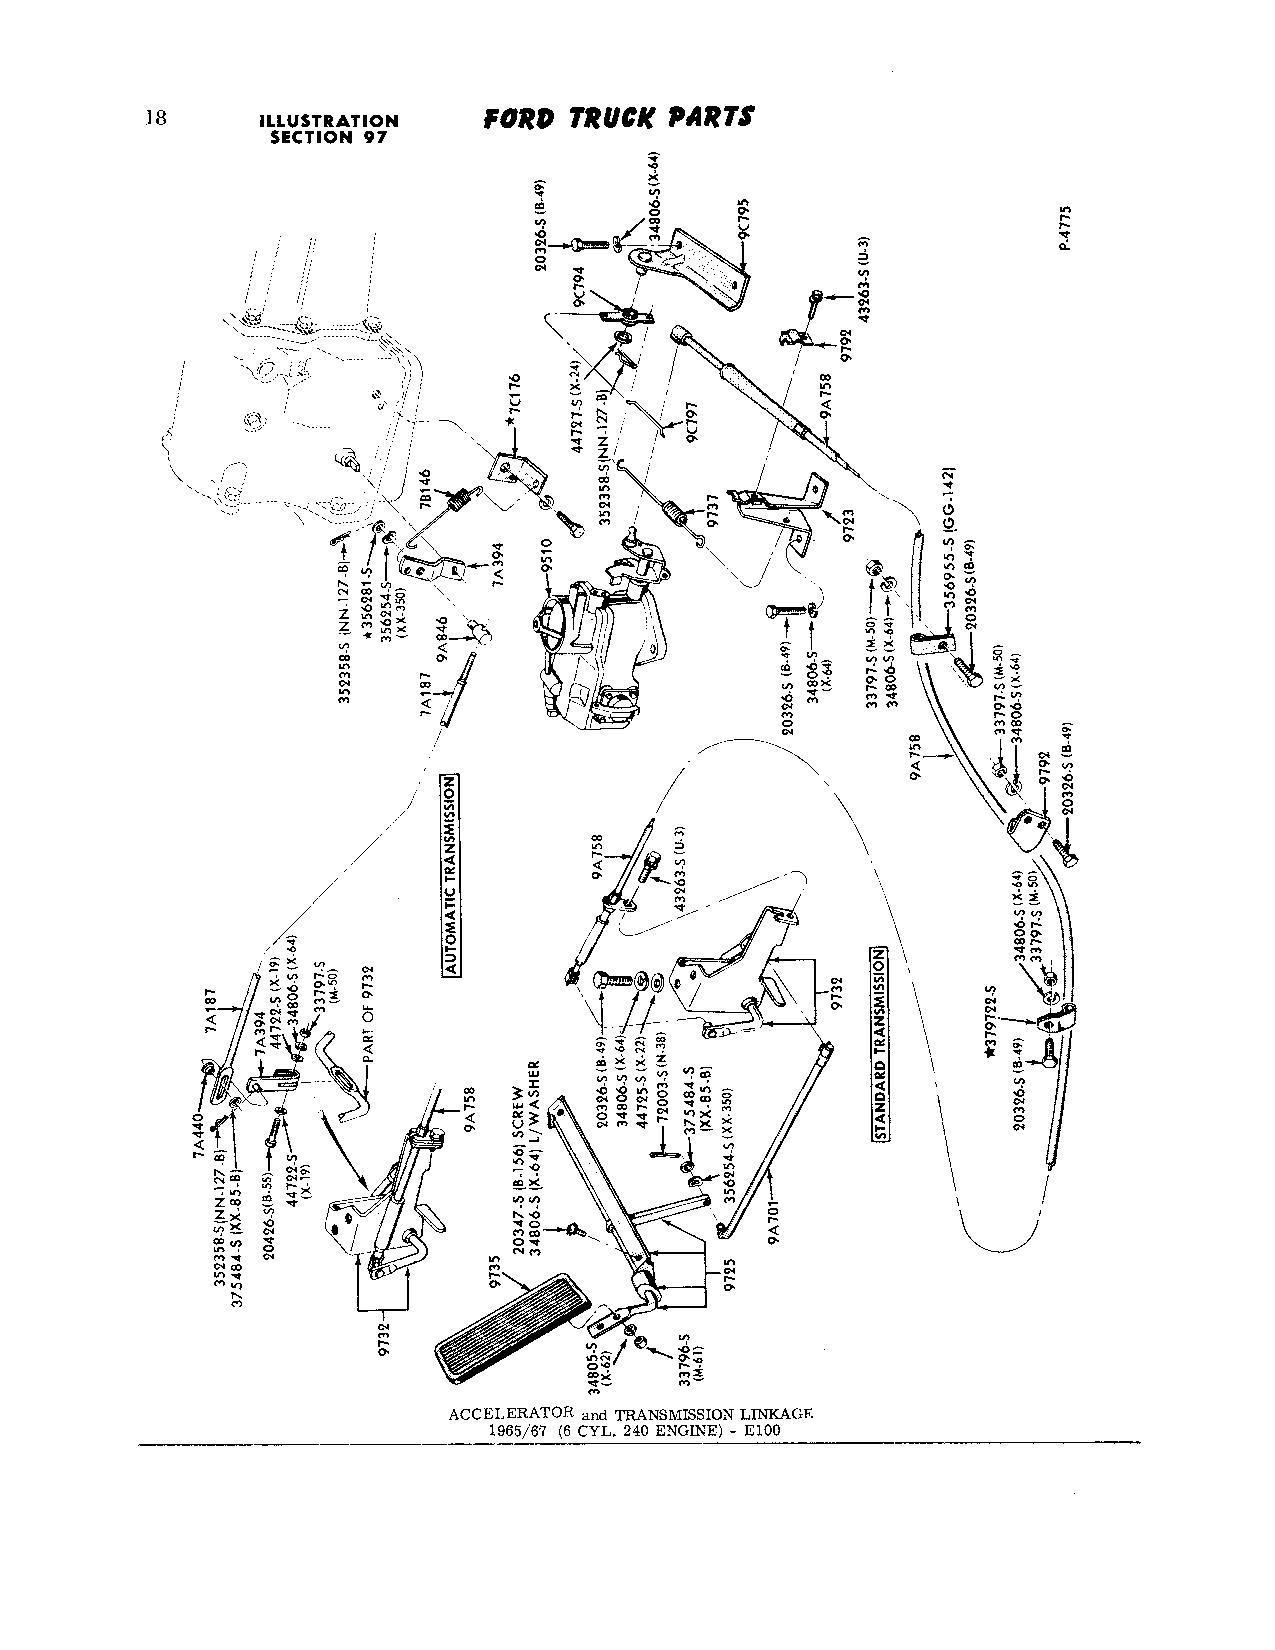 Throttle Linkage Diagram Photo Request 68 240 Cid F 100